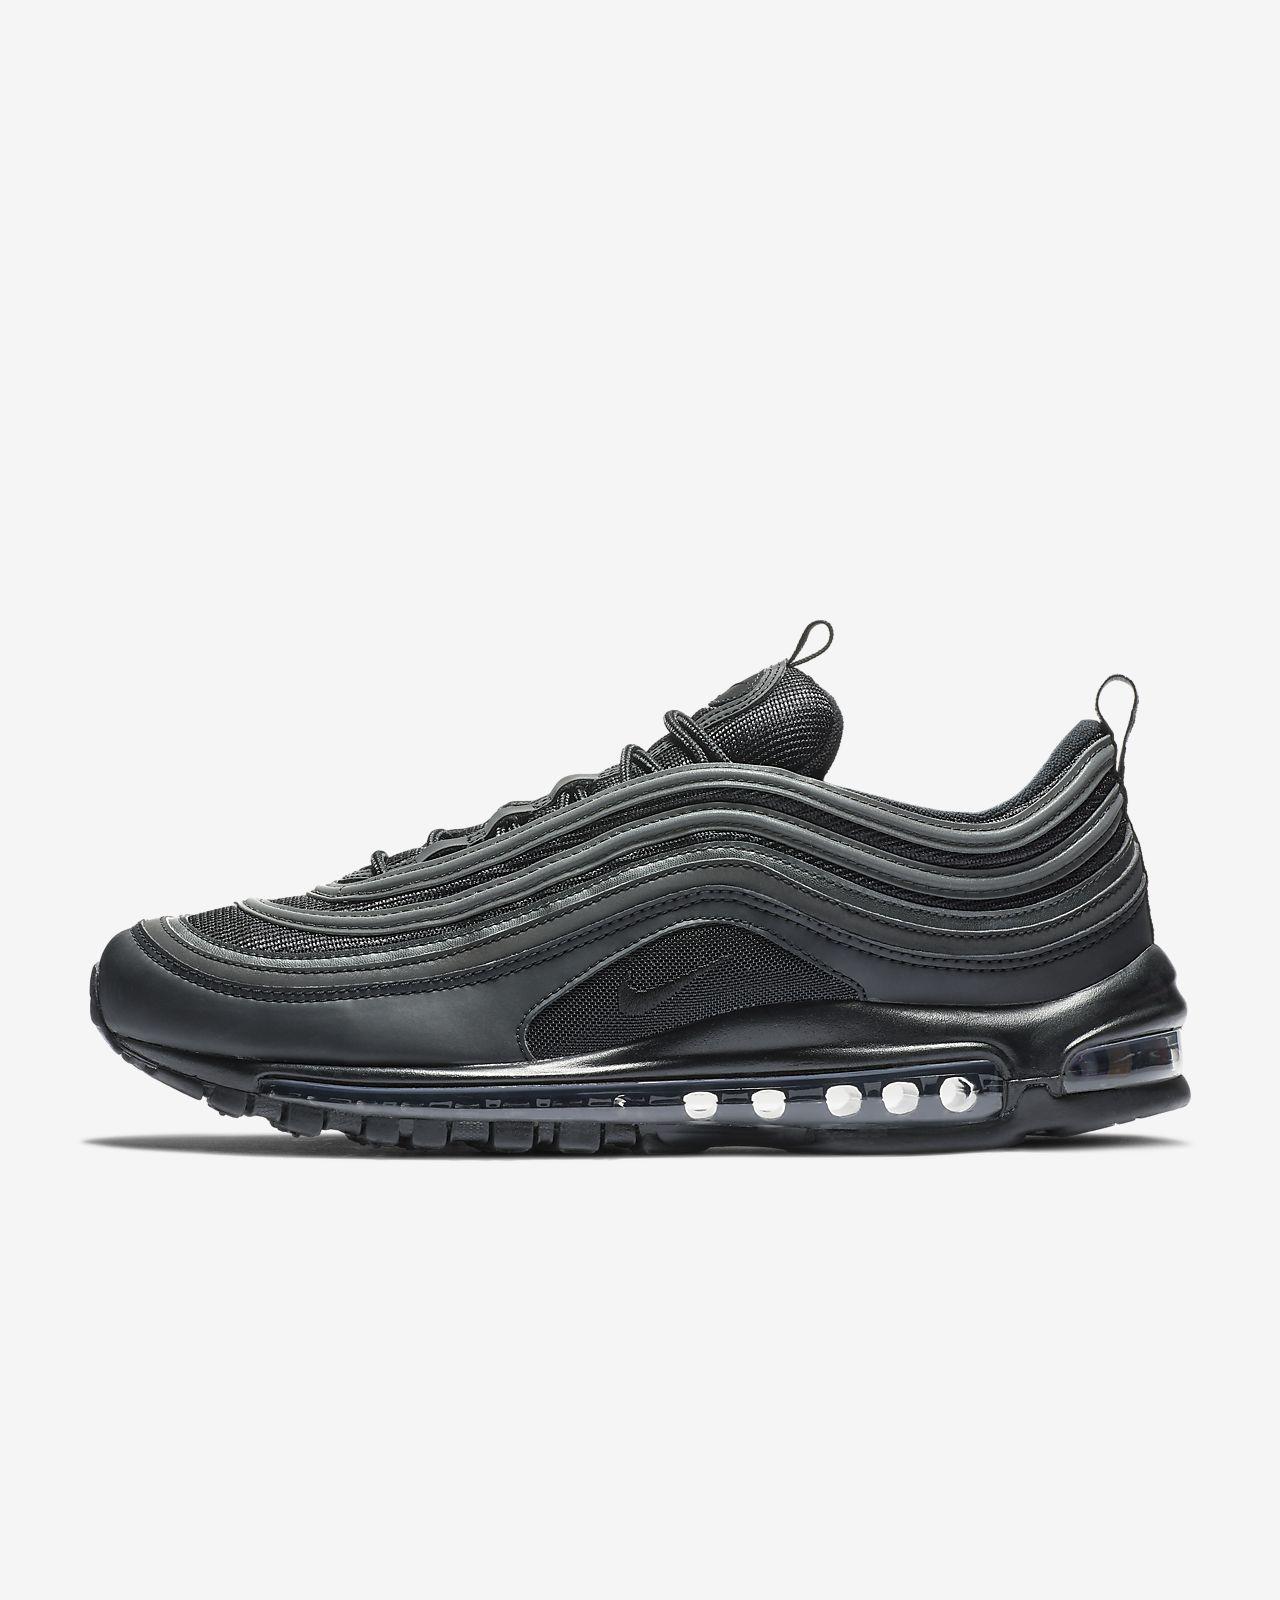 Nike Buty męskie Air Max 97 czarne r. 44.5 (BQ4567 001) w